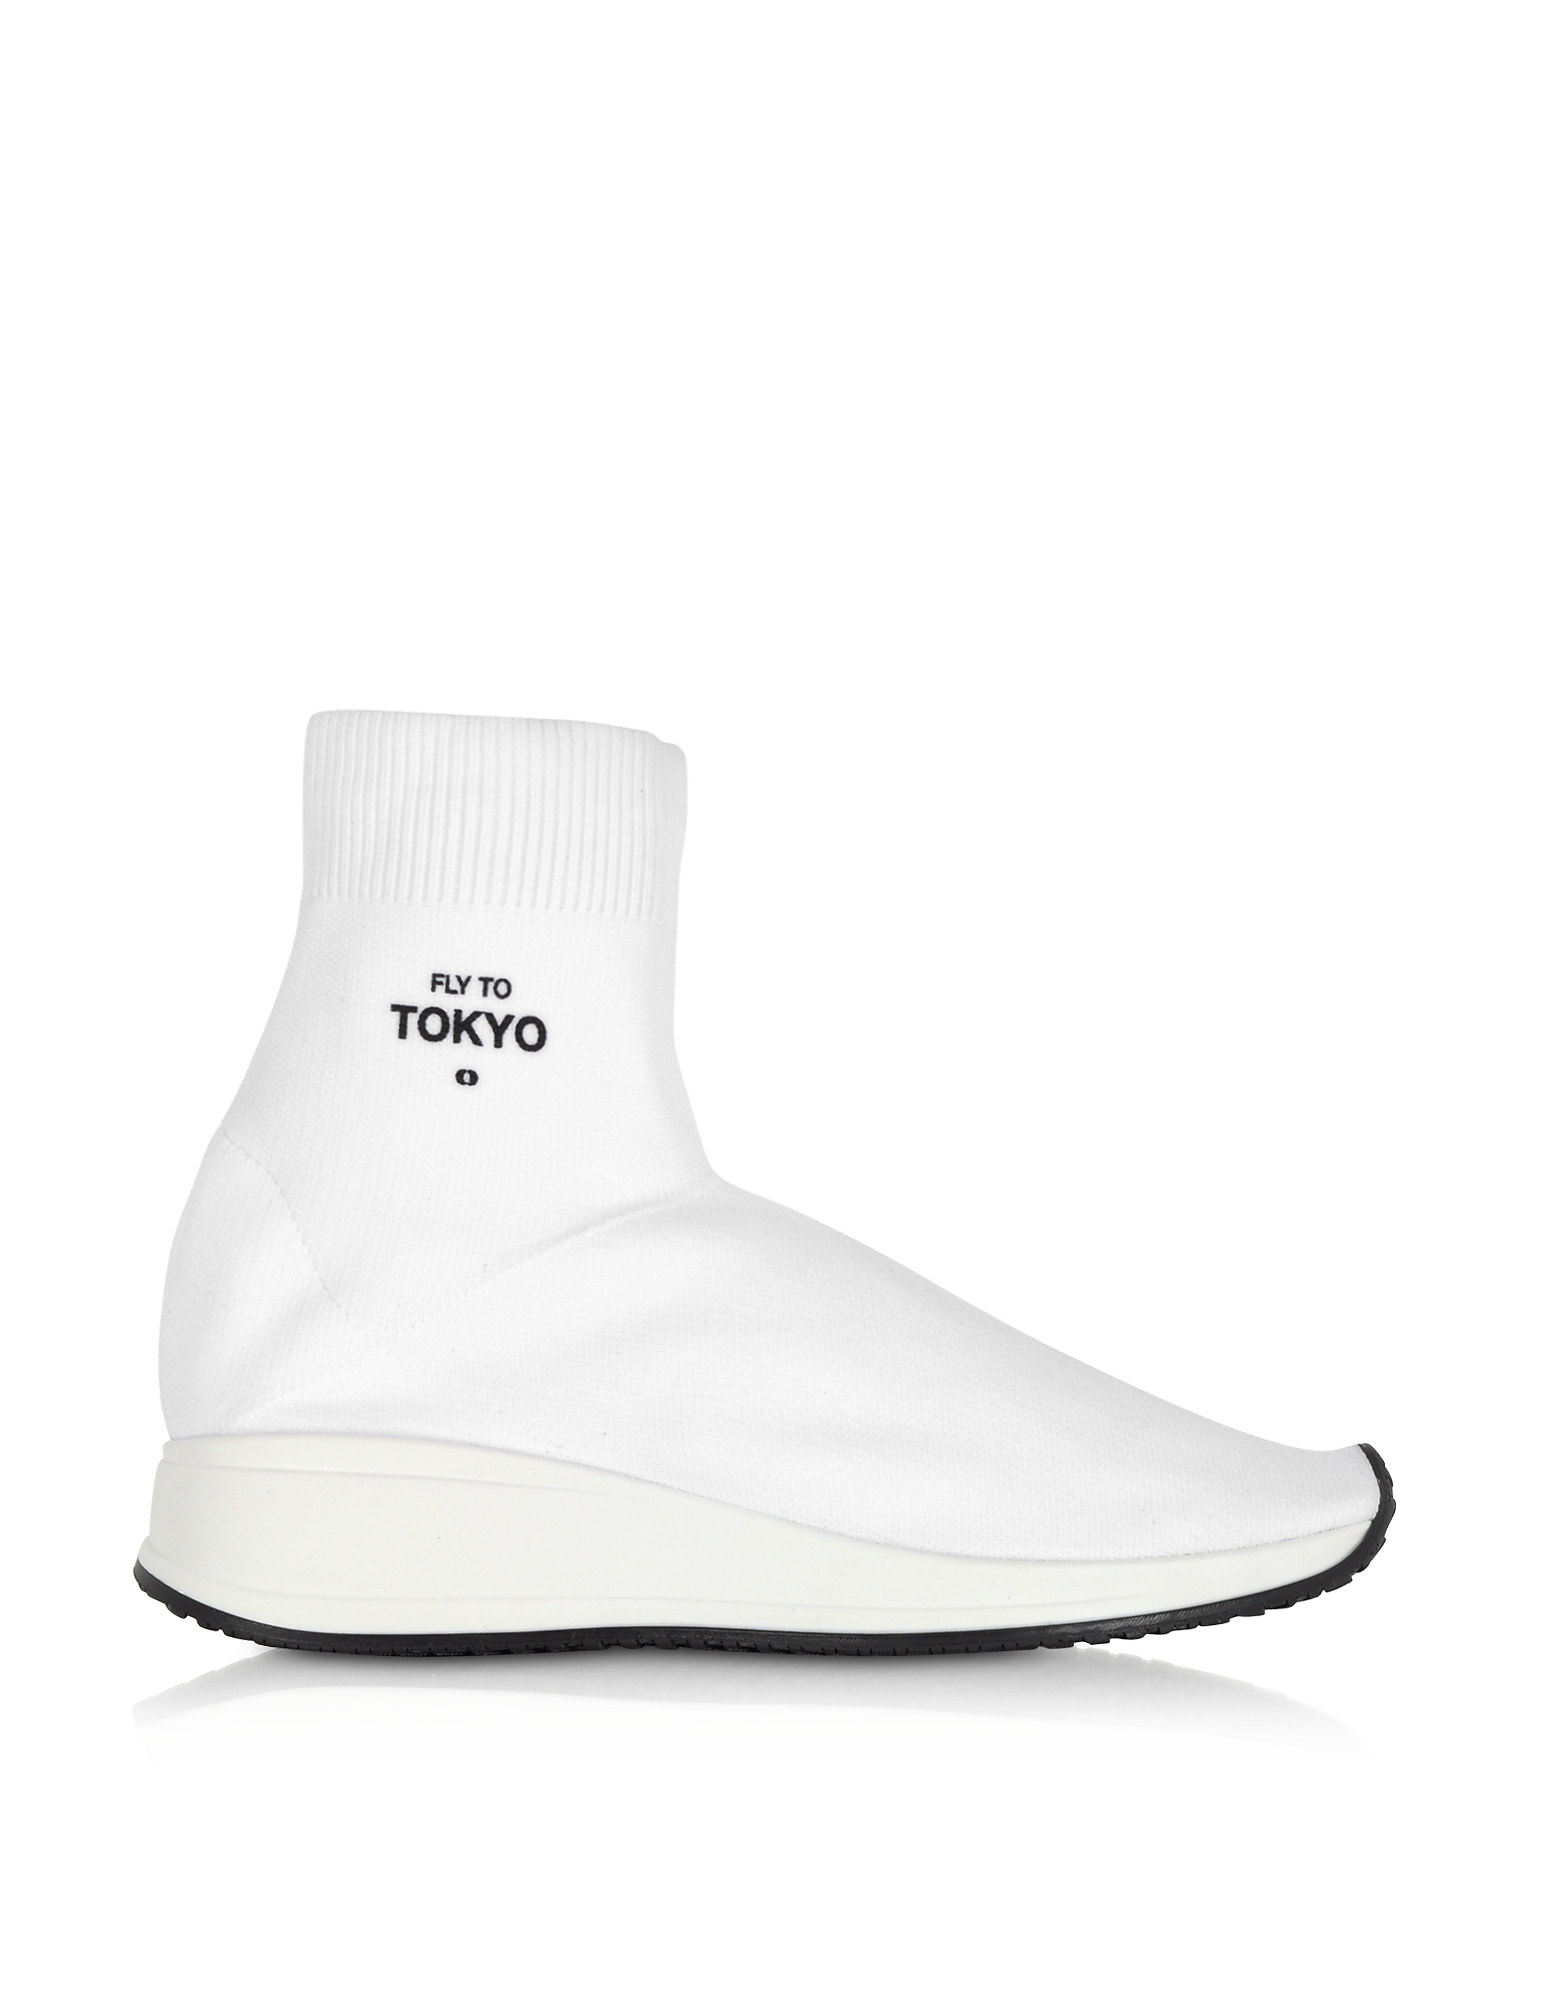 Fly To Tokyo - Белые Кеды Носок Унисекс из Нейлона